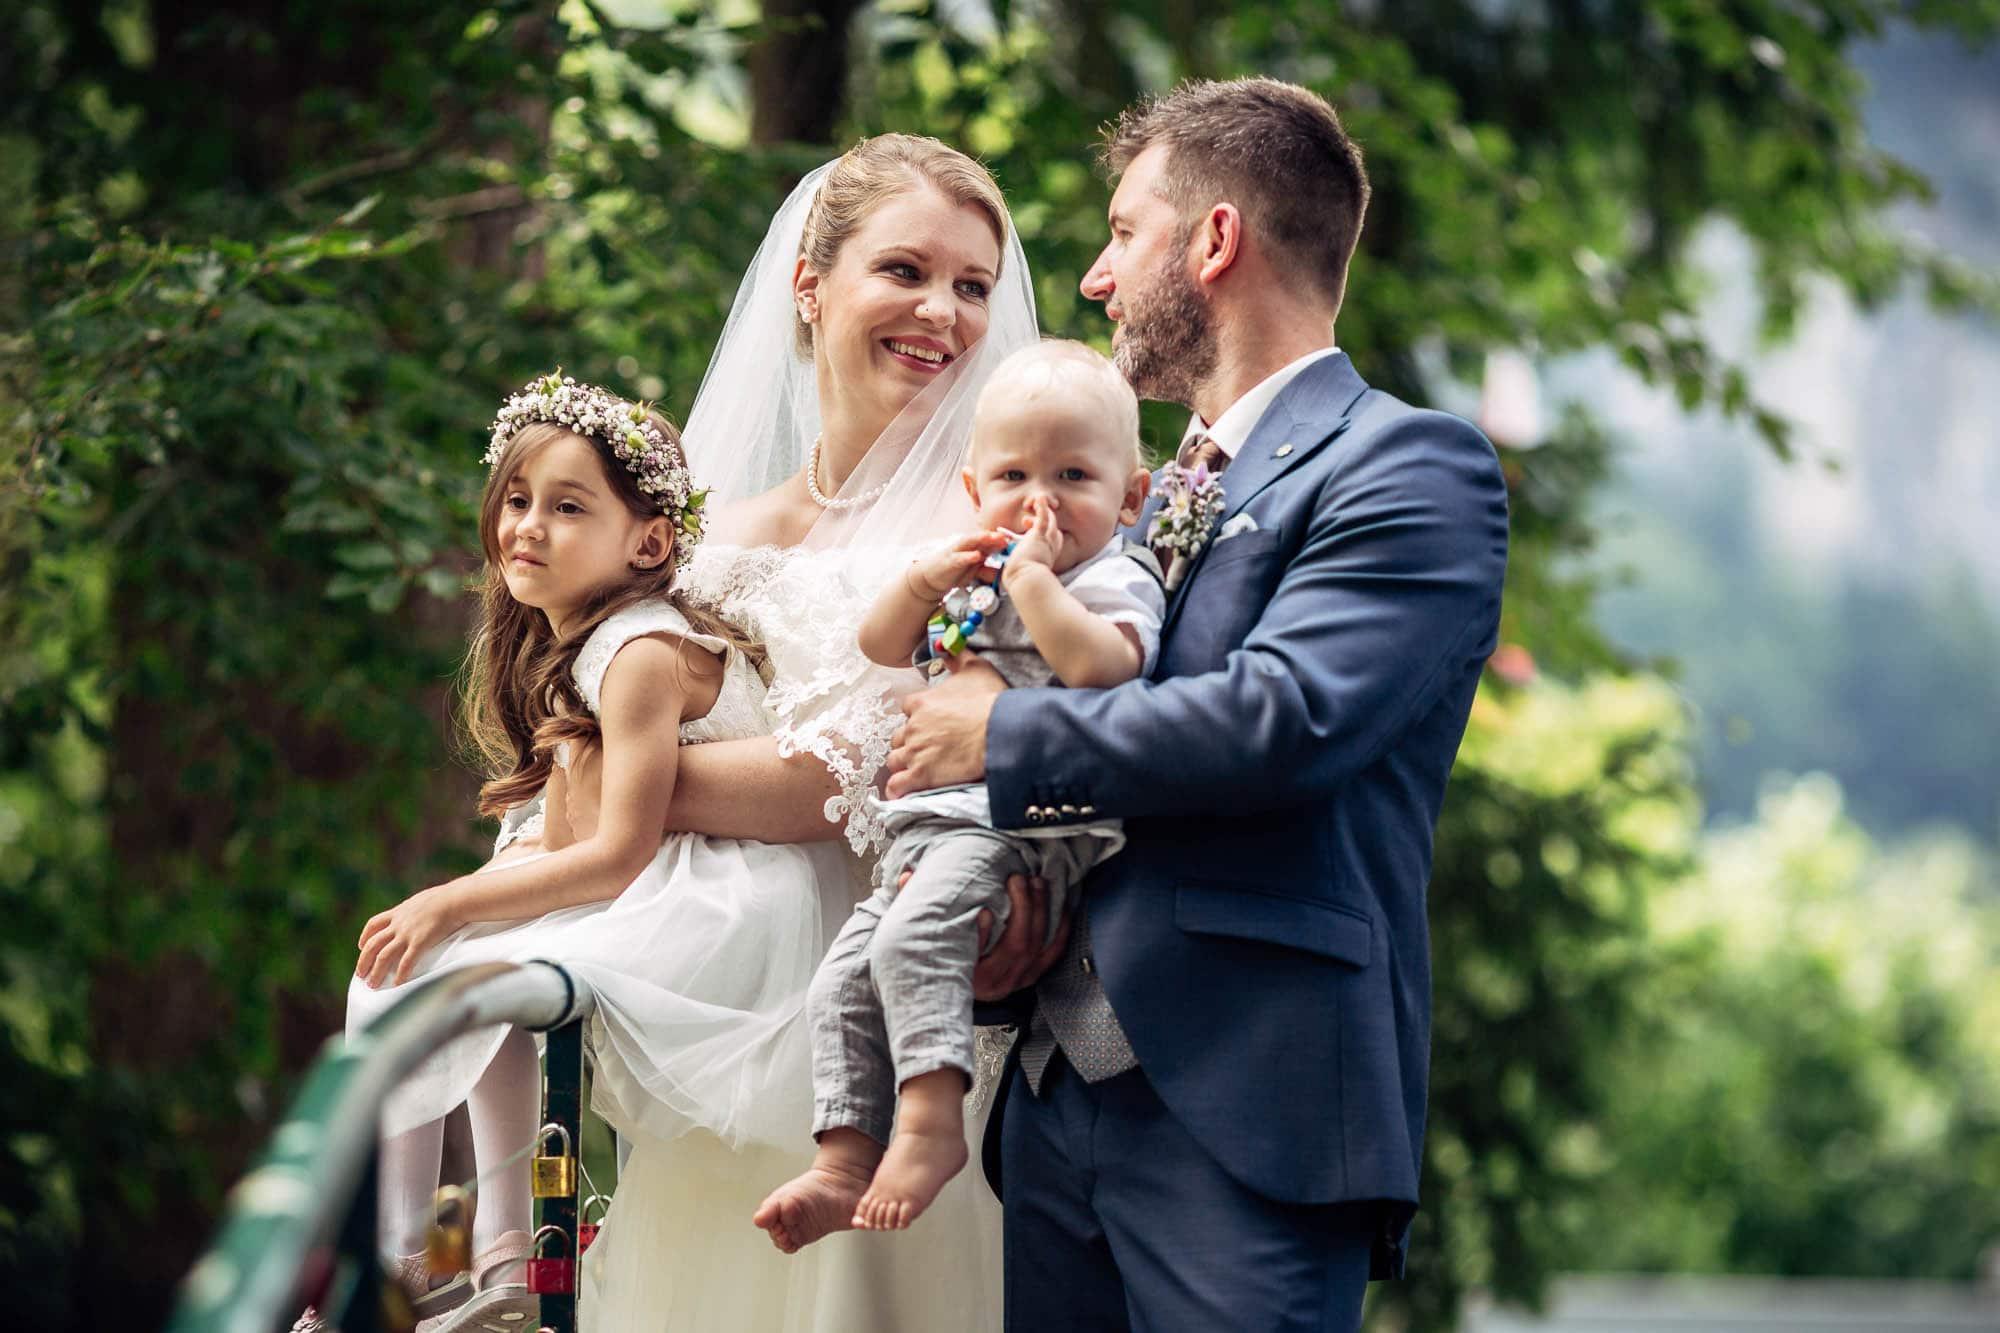 Brautpaar Hochzeitsfotograf Vitznau. Paar schaut sich an